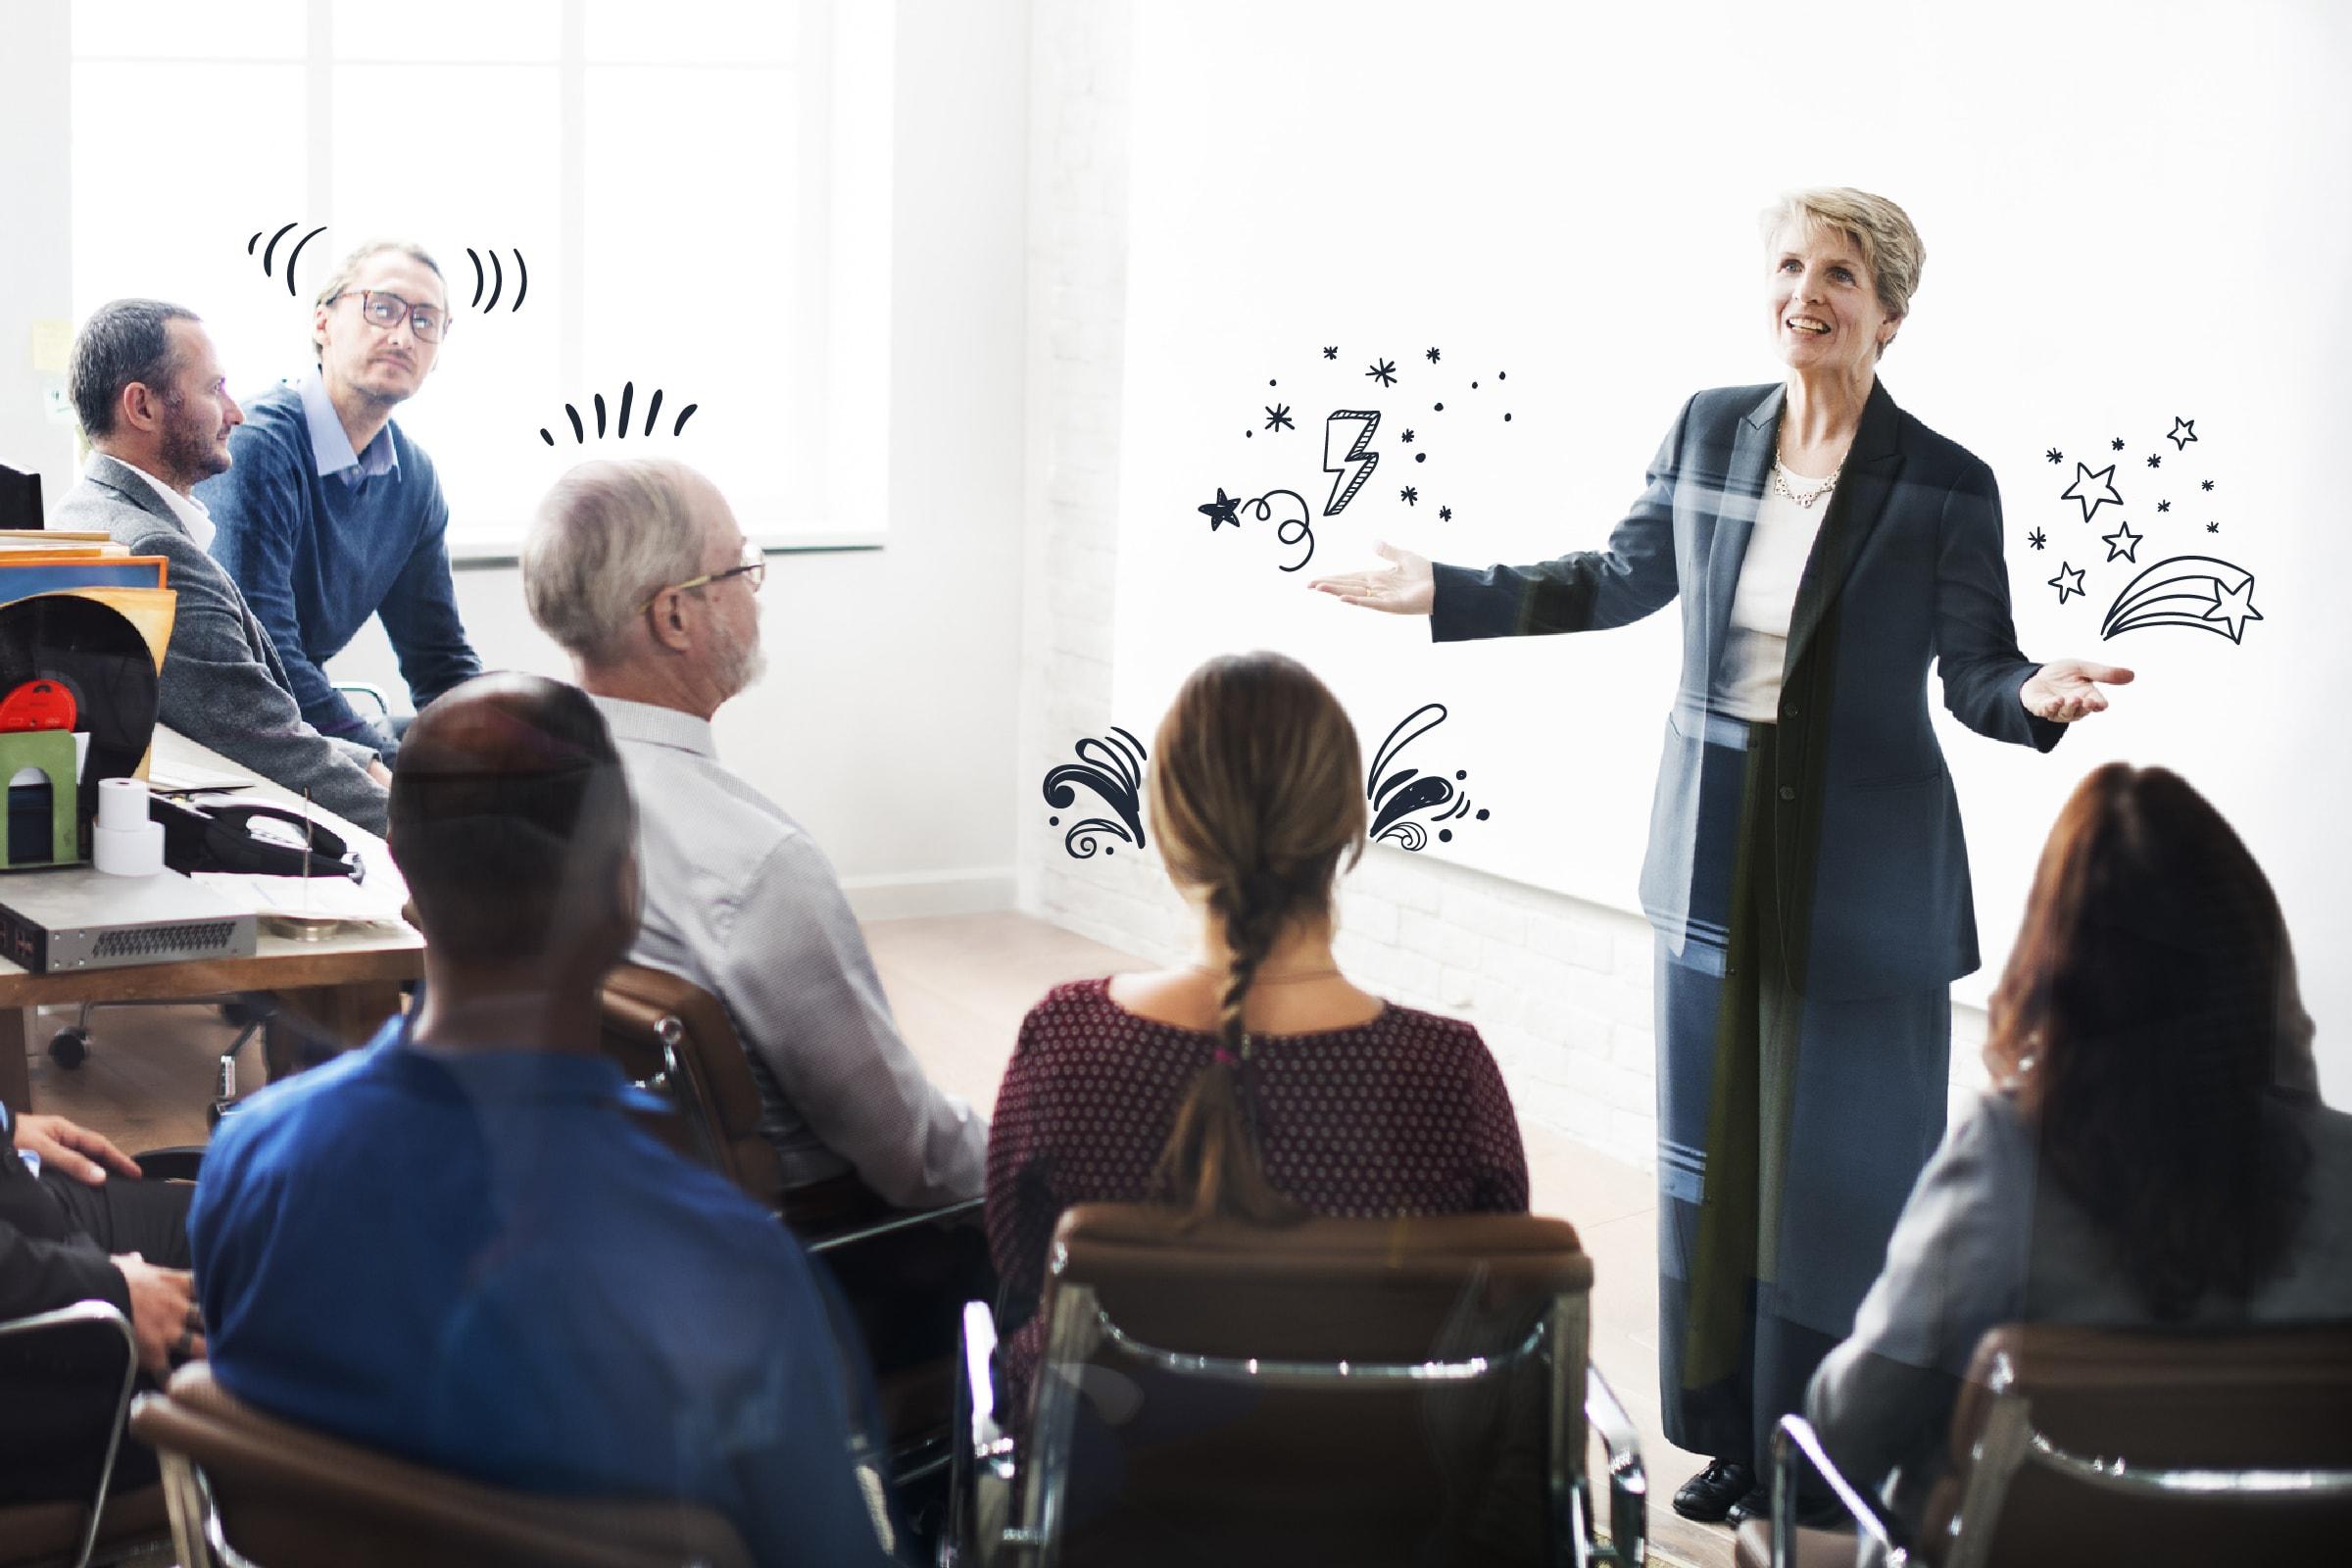 Expert Advice 18 Ways to Nail Your Next Sales Presentation – Sales Presentation